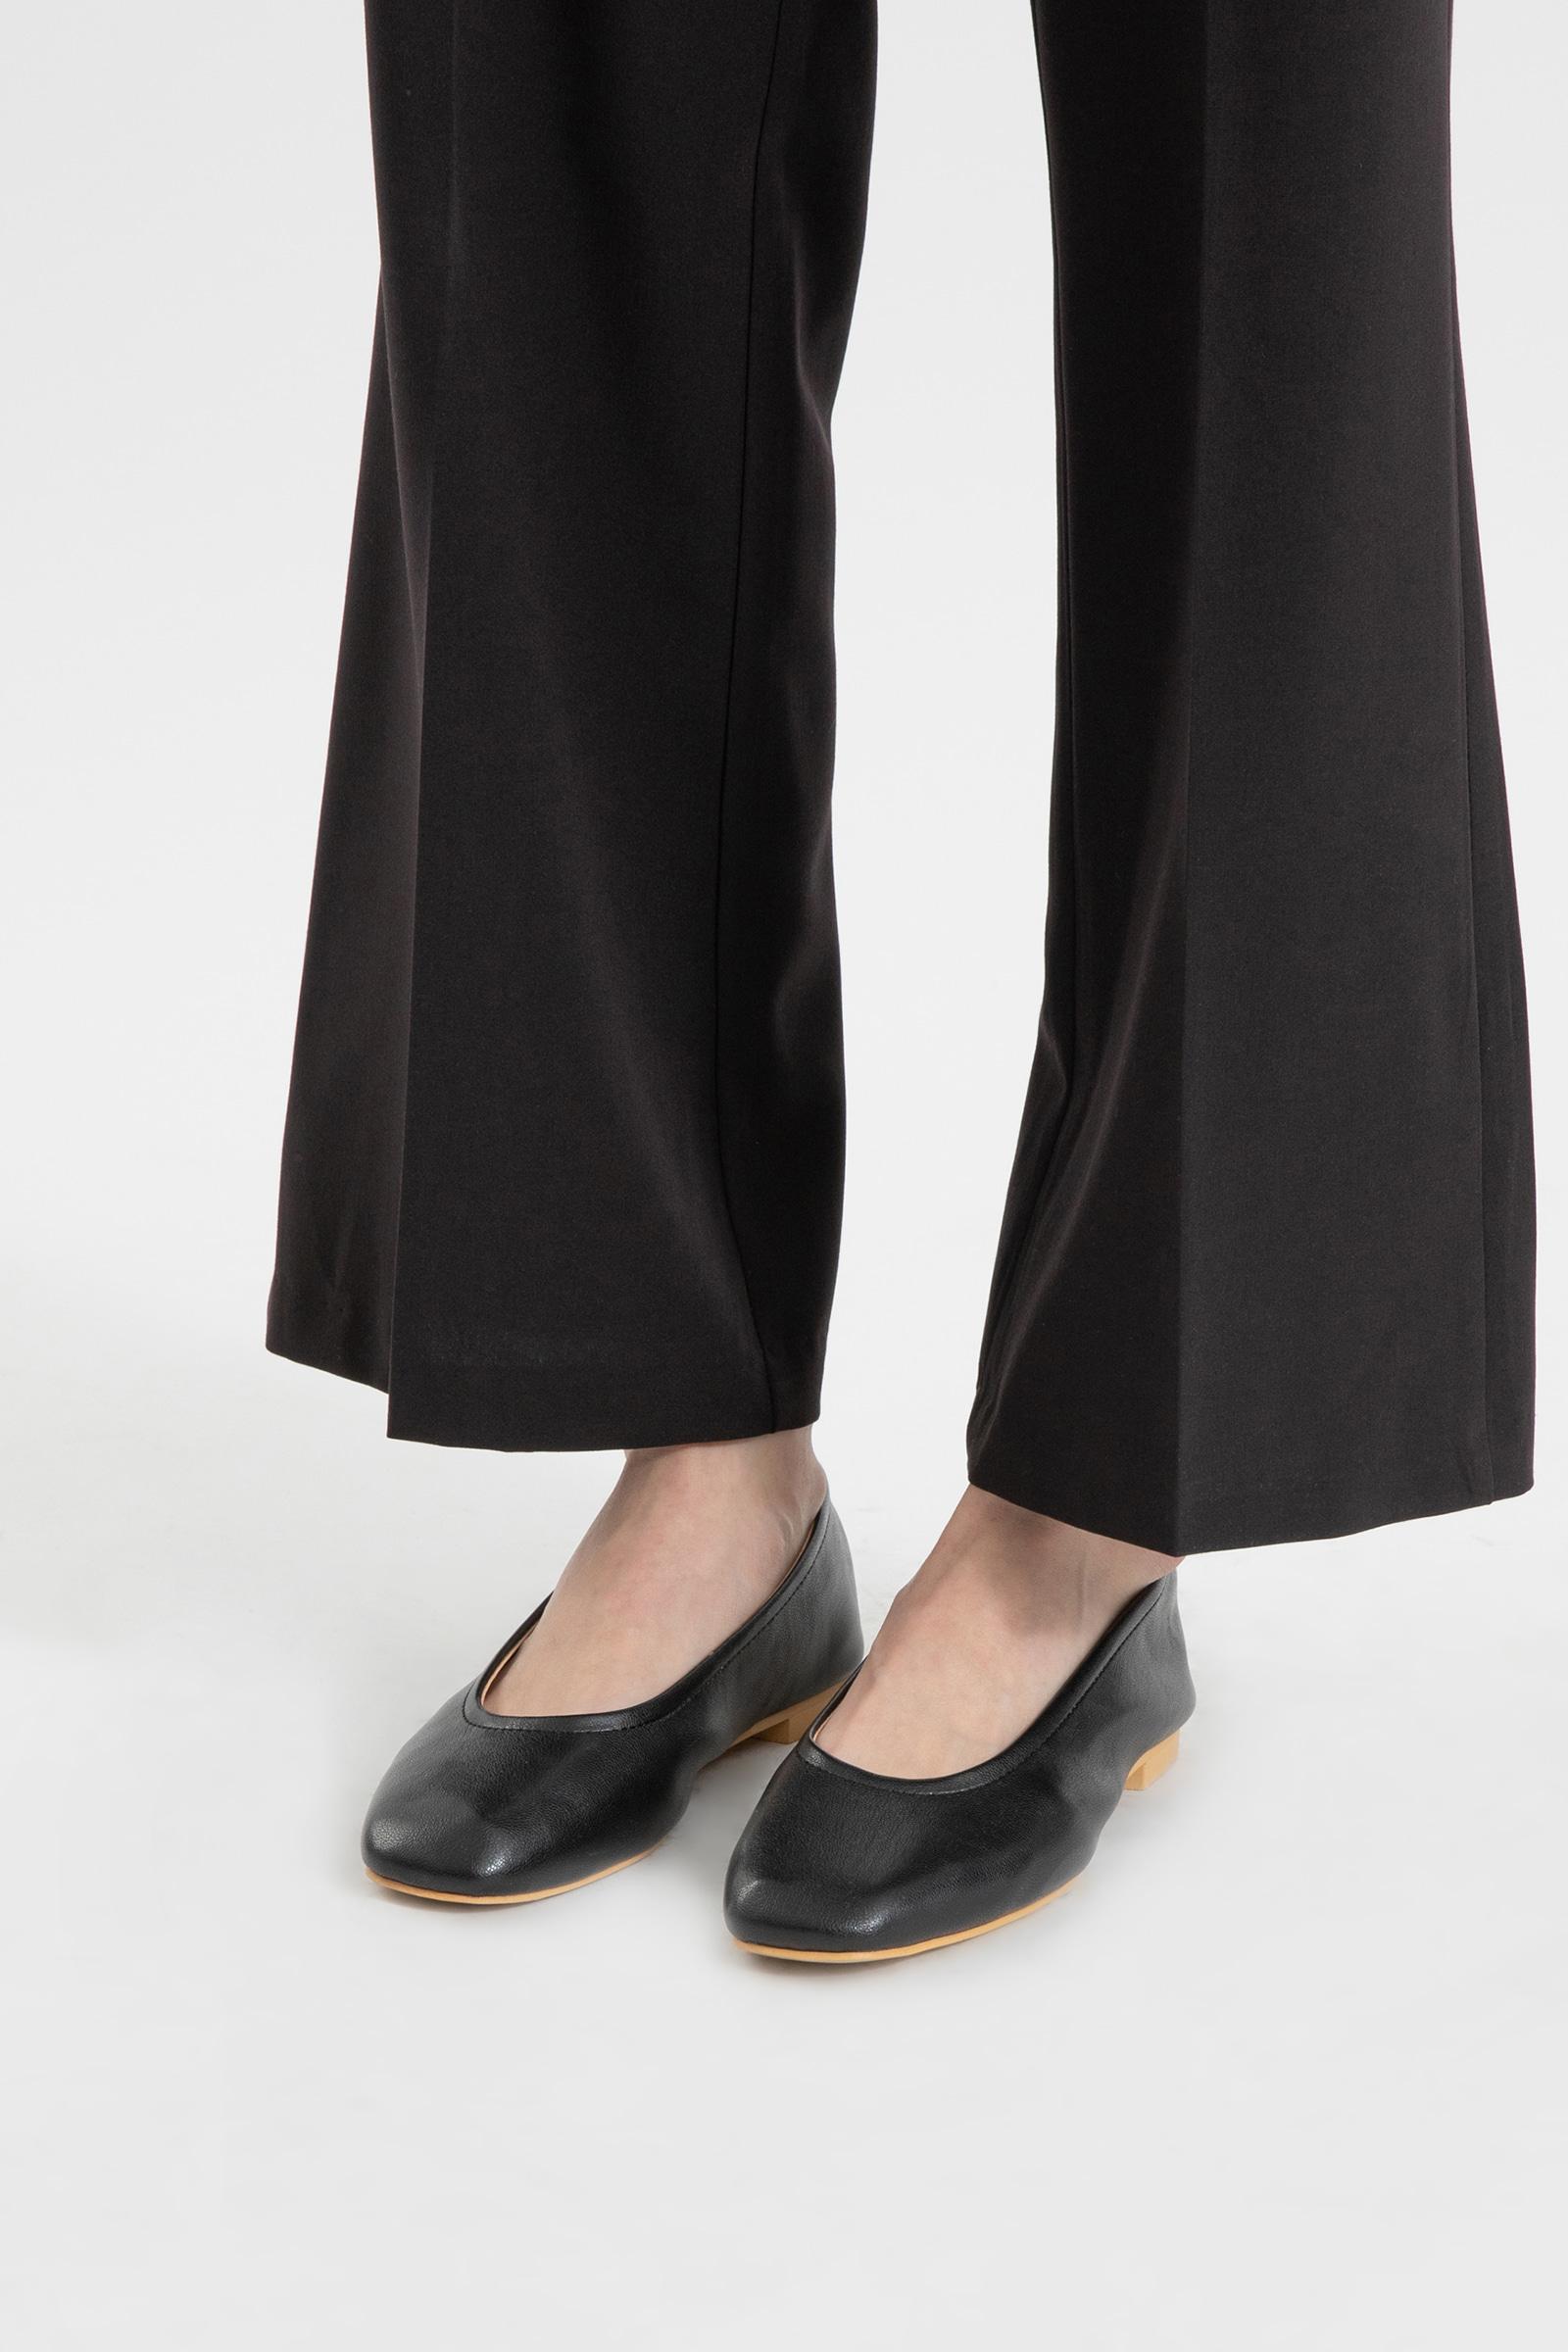 Find simple boots cut slacks